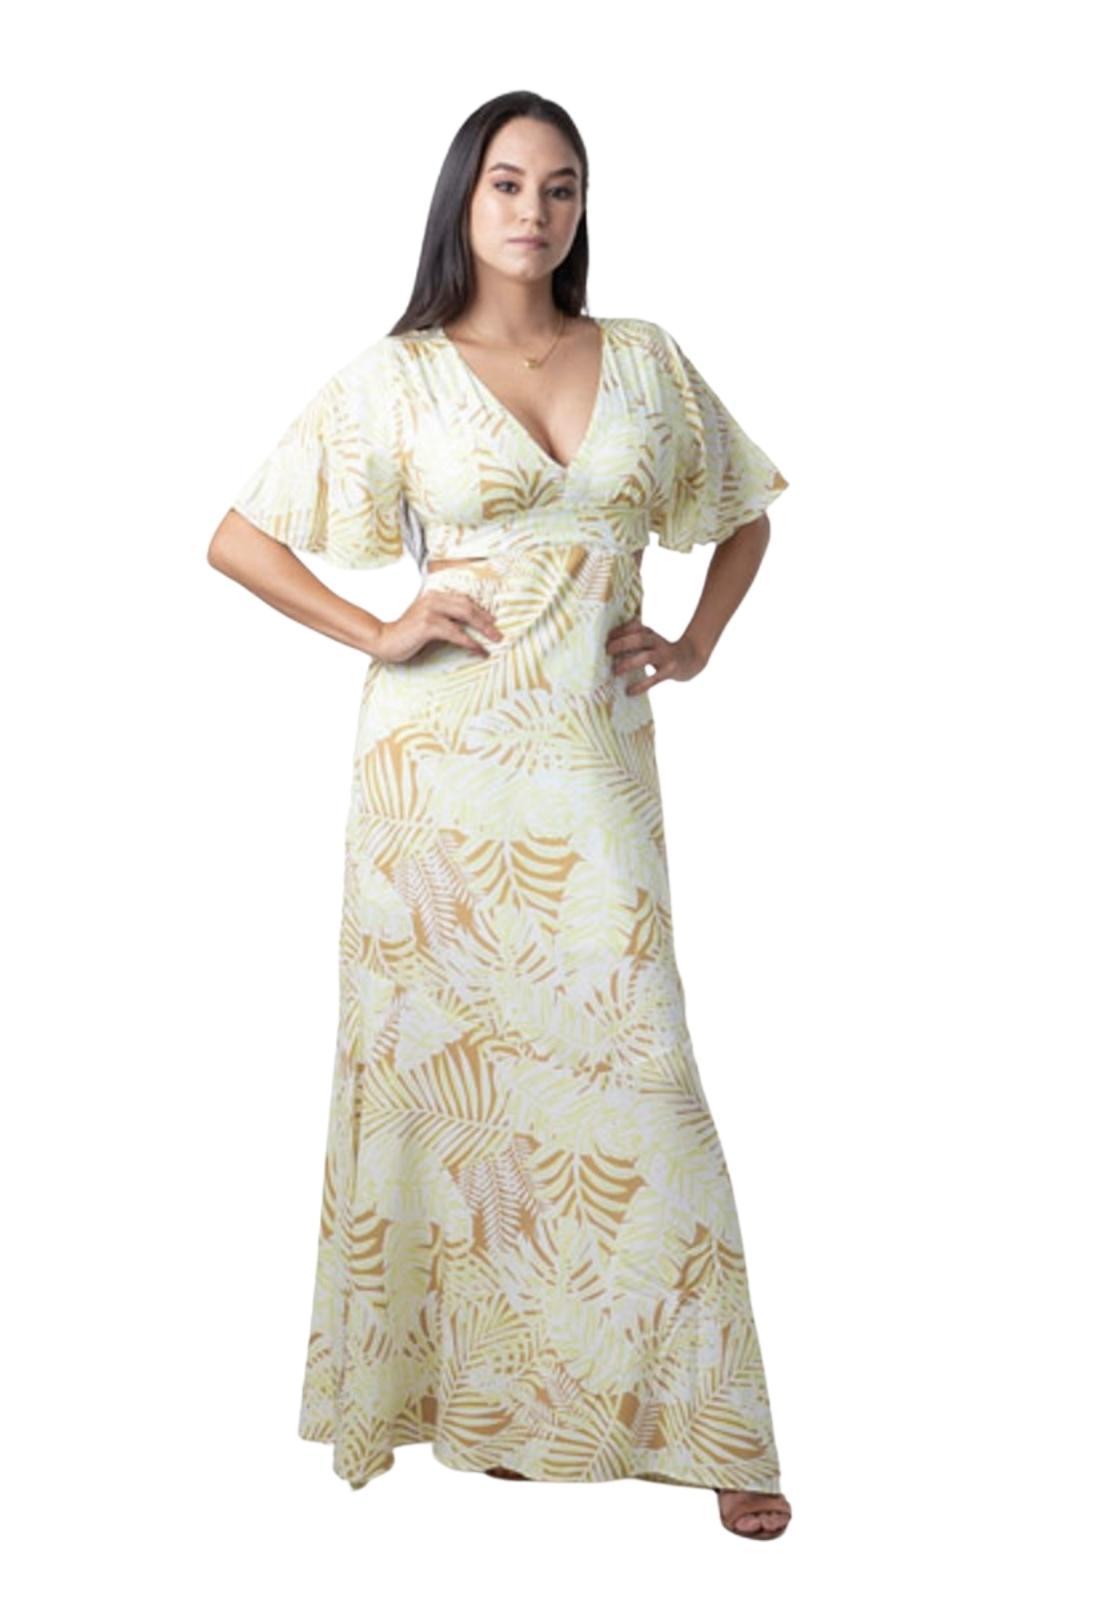 Vestido Longo Feminino Manga Ampla Abertura Lateral Estampa